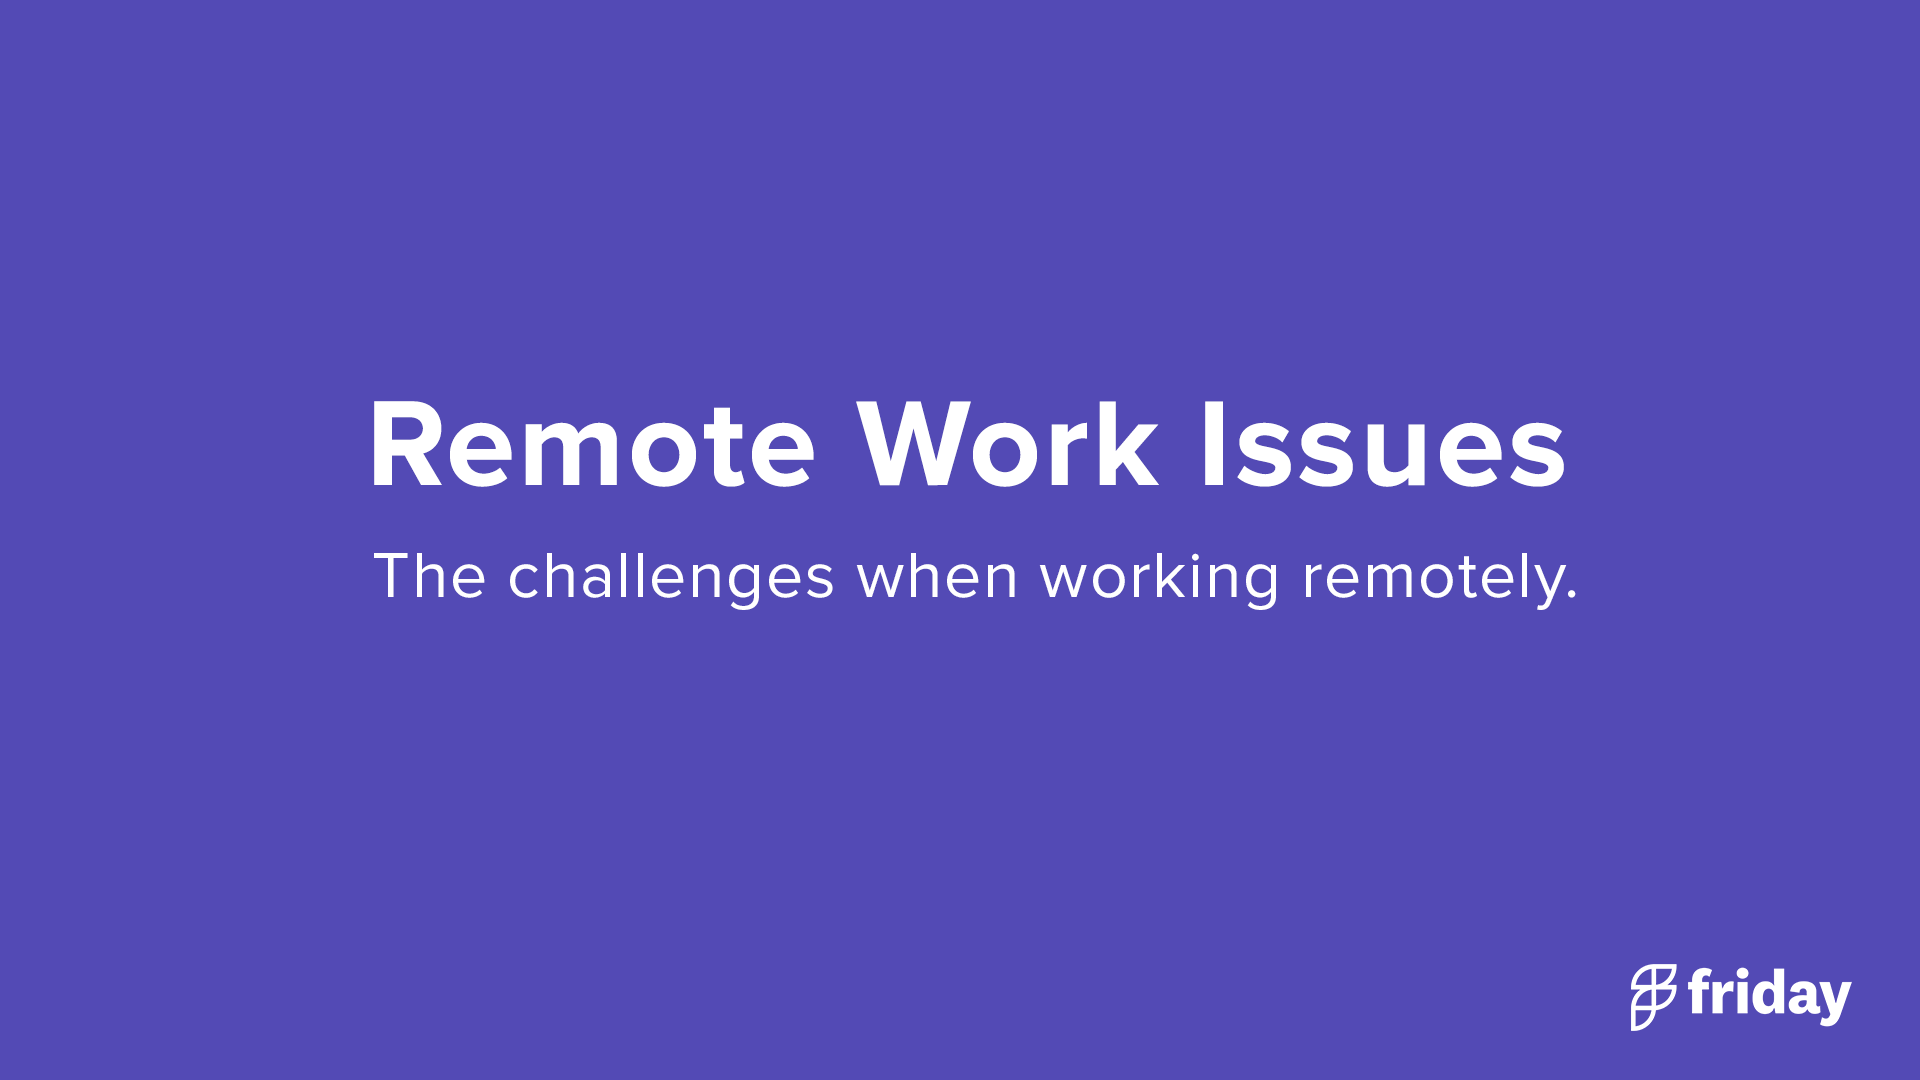 Downsides of Remote Work